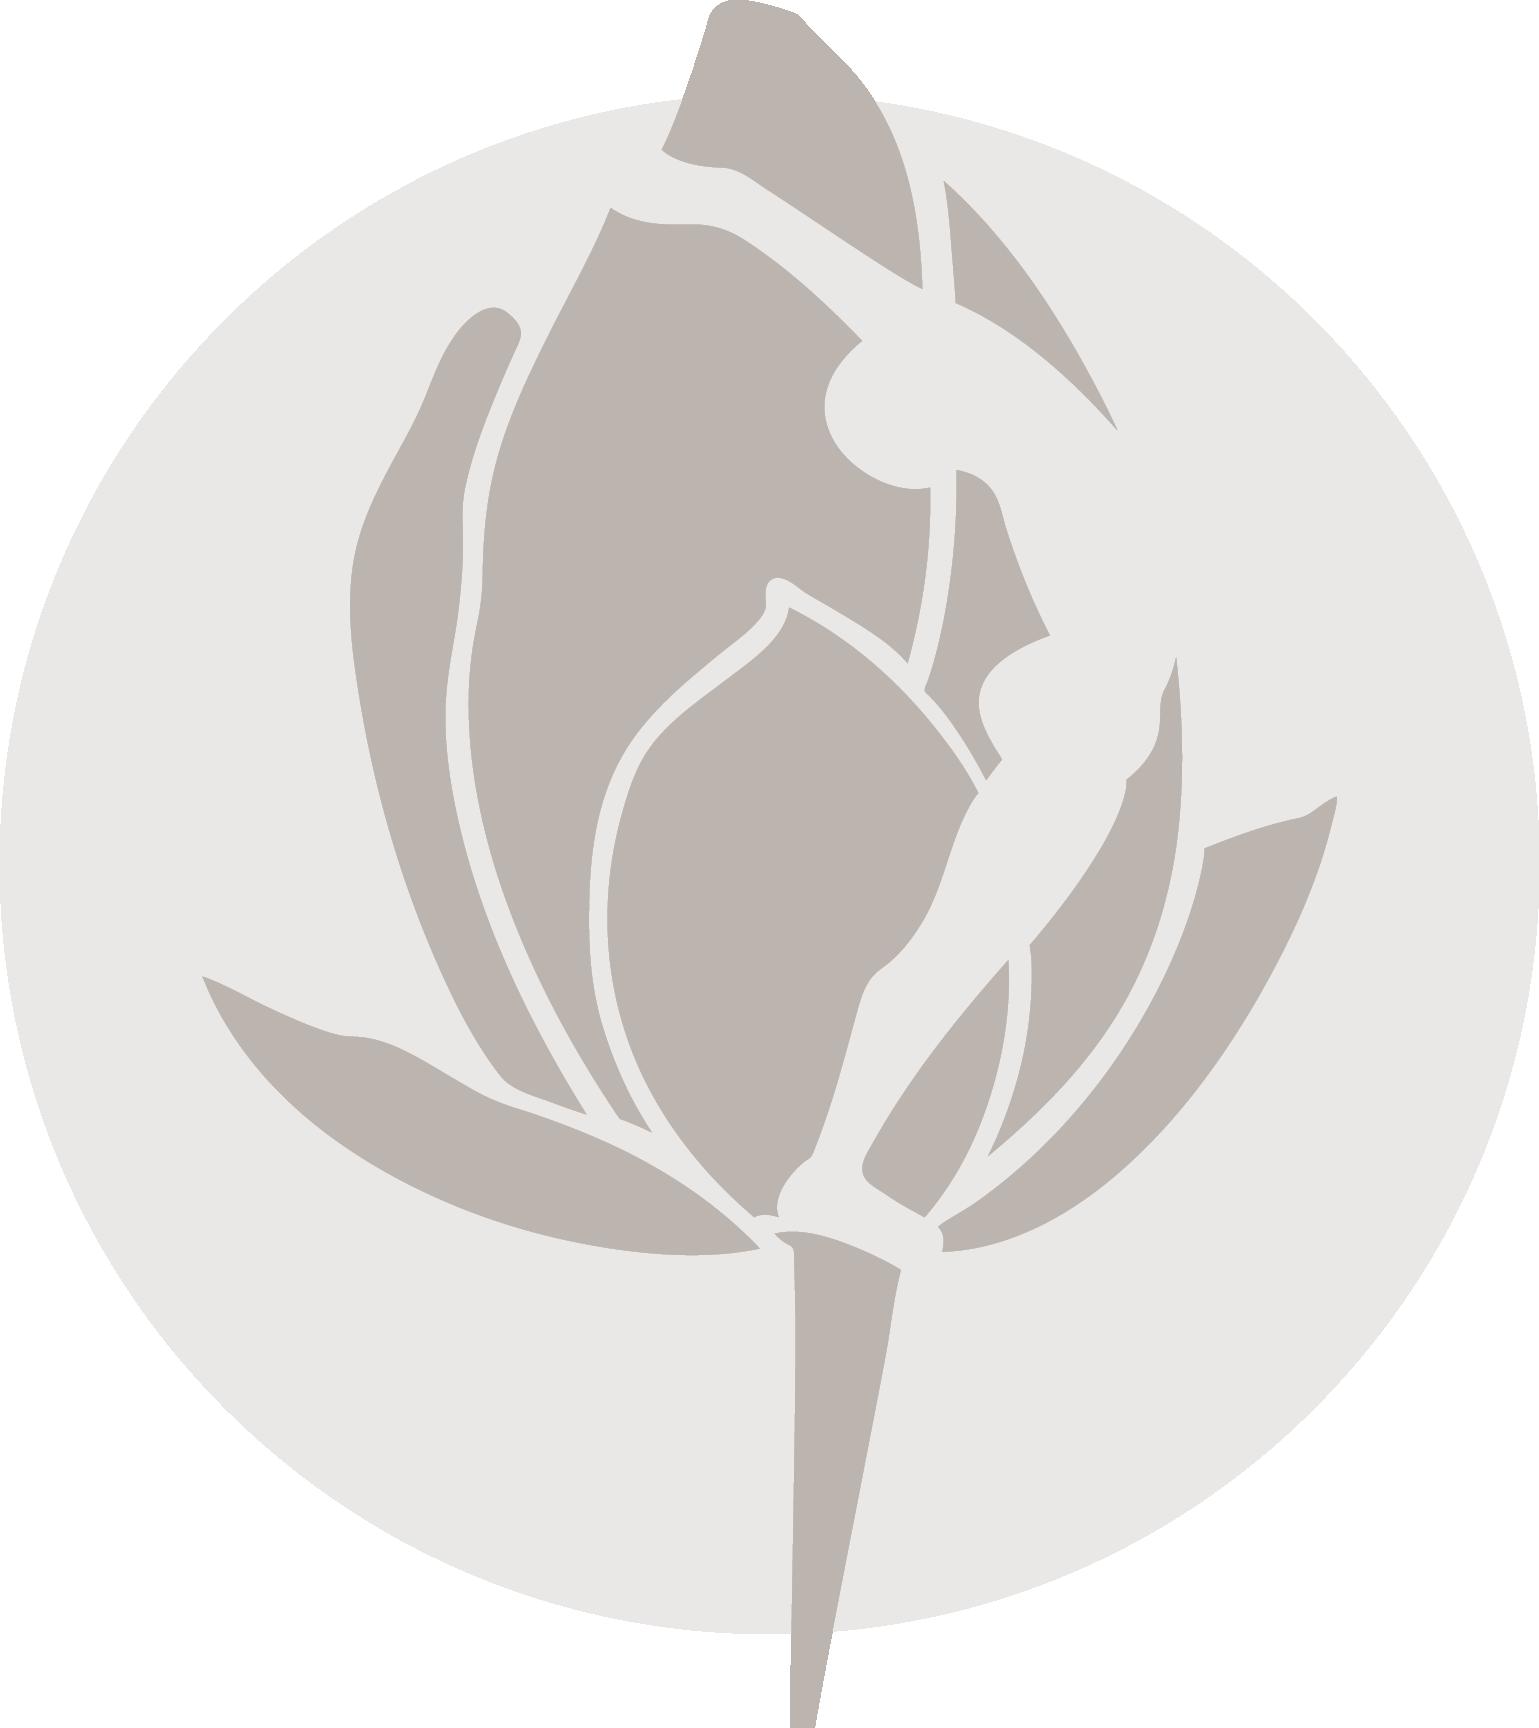 Yoga santosha icon gray